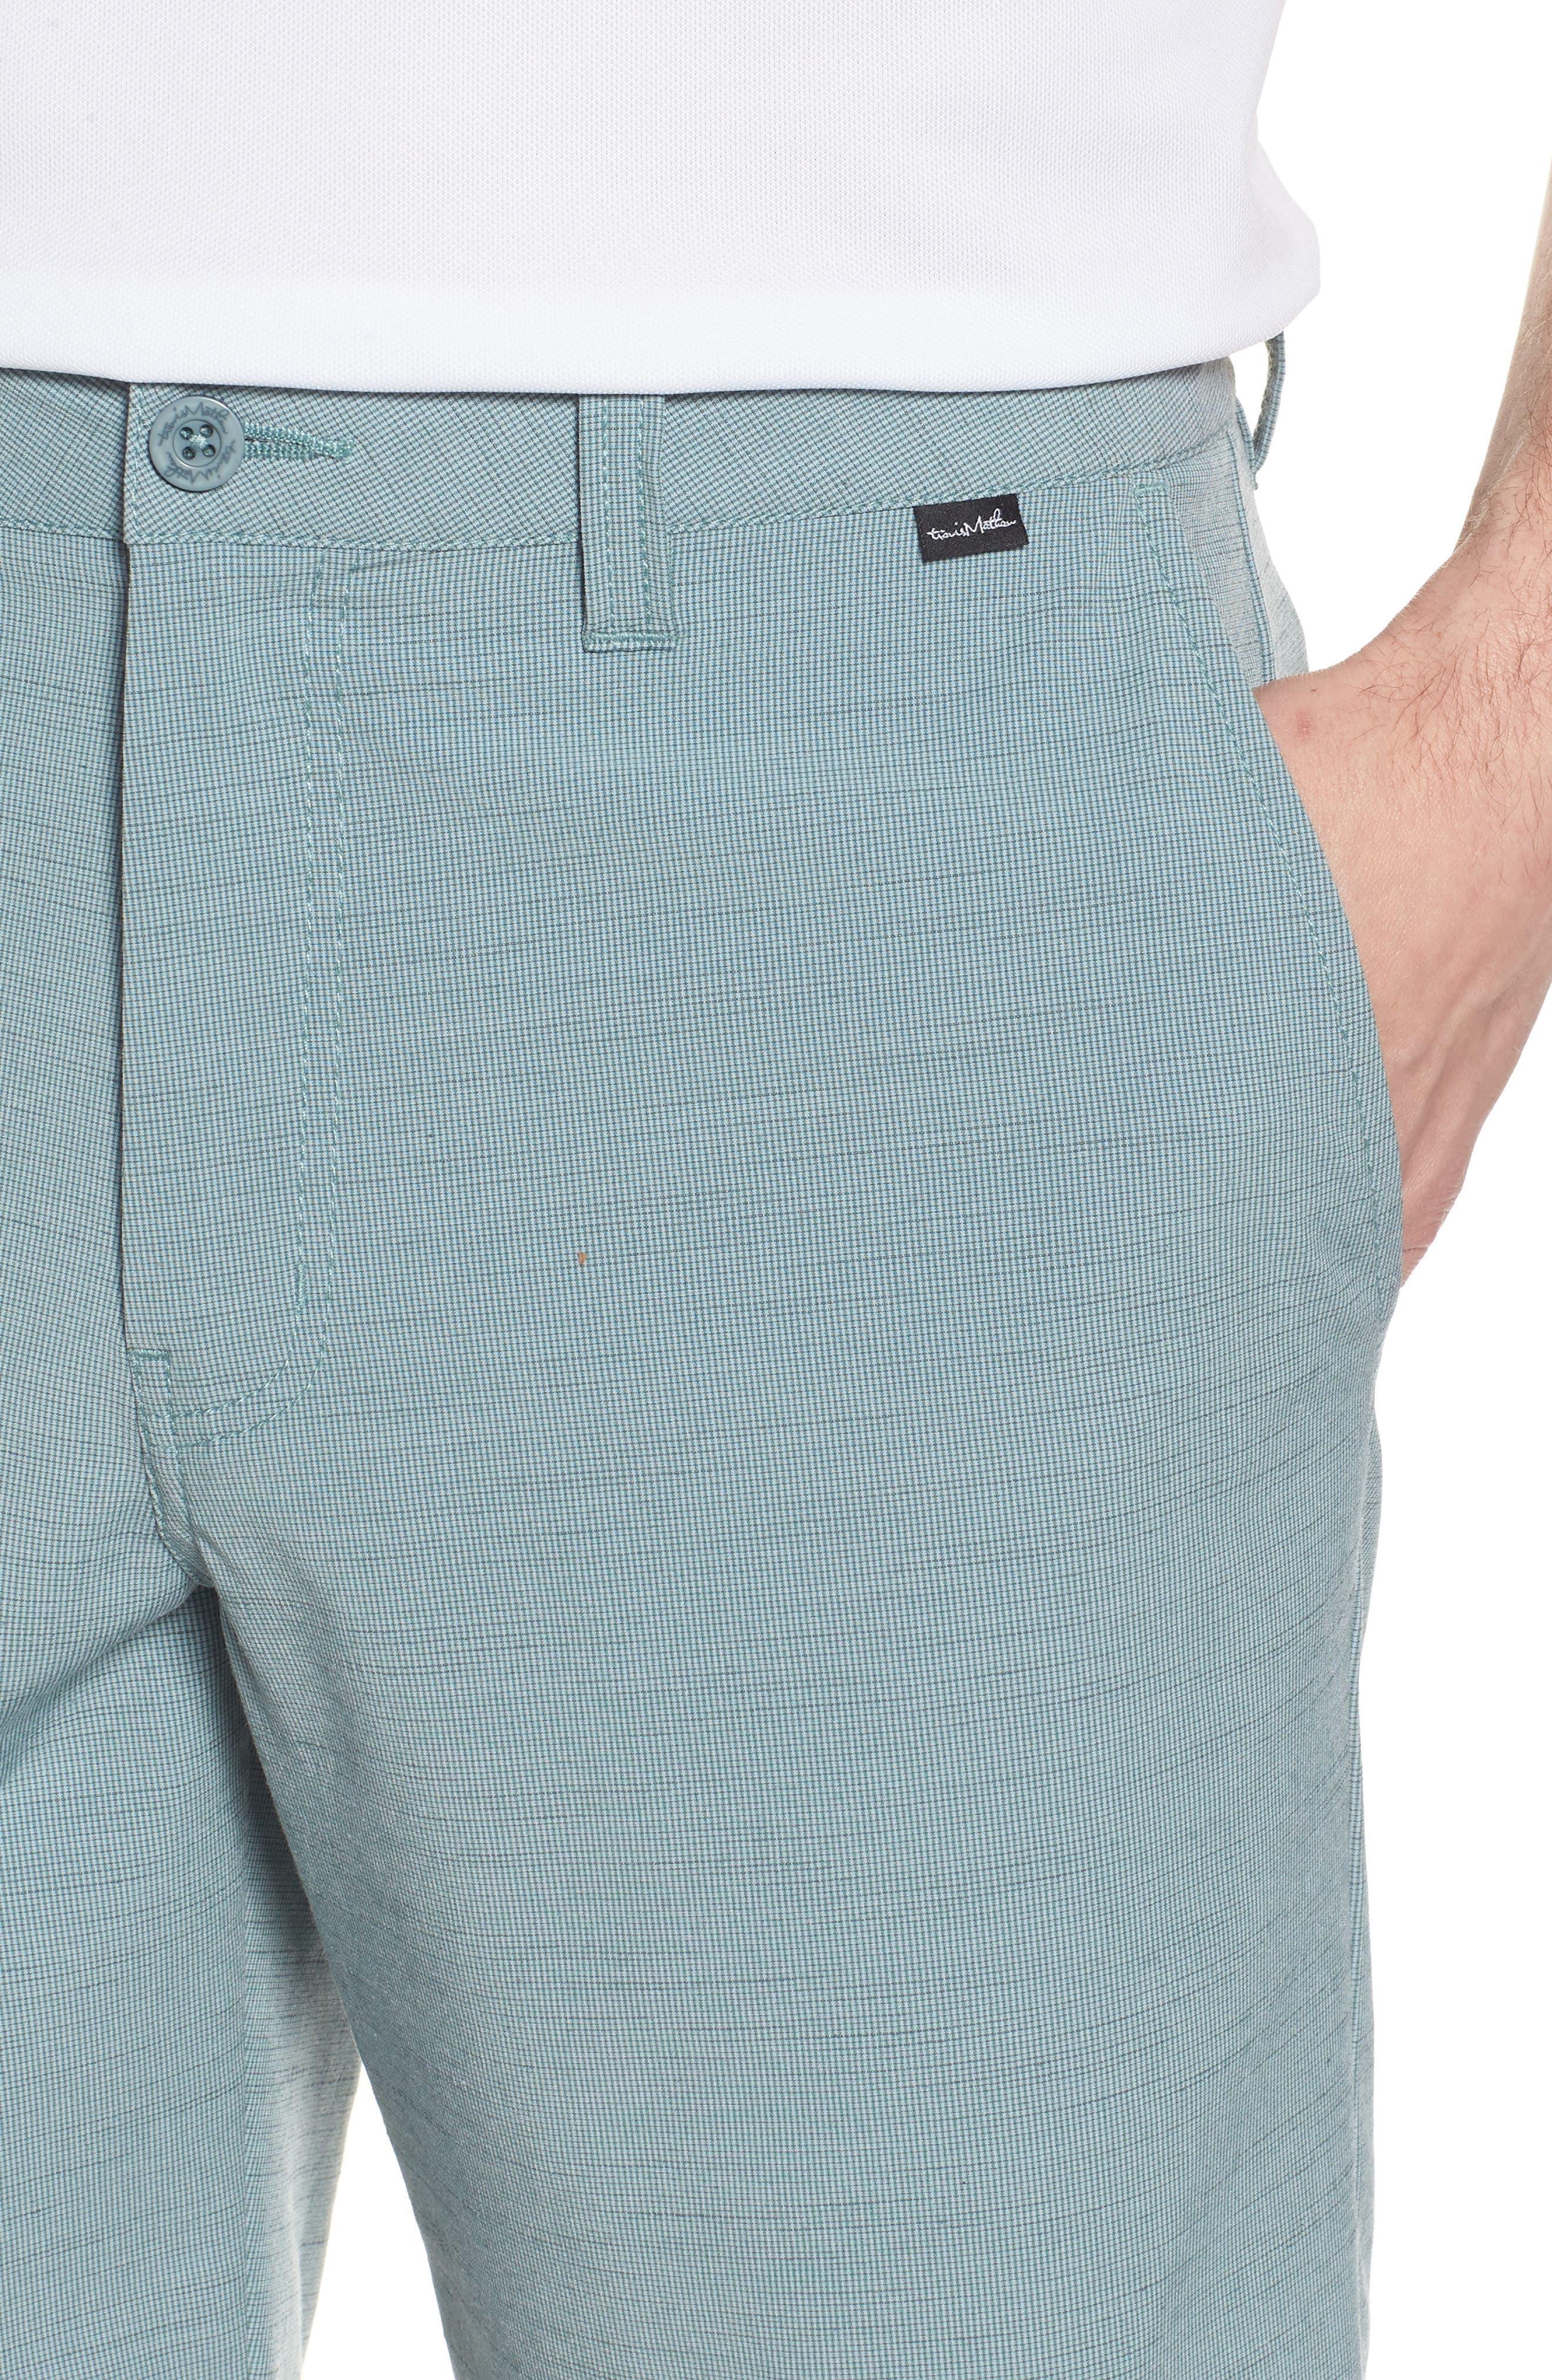 Tulum Stretch Shorts,                             Alternate thumbnail 4, color,                             Canton